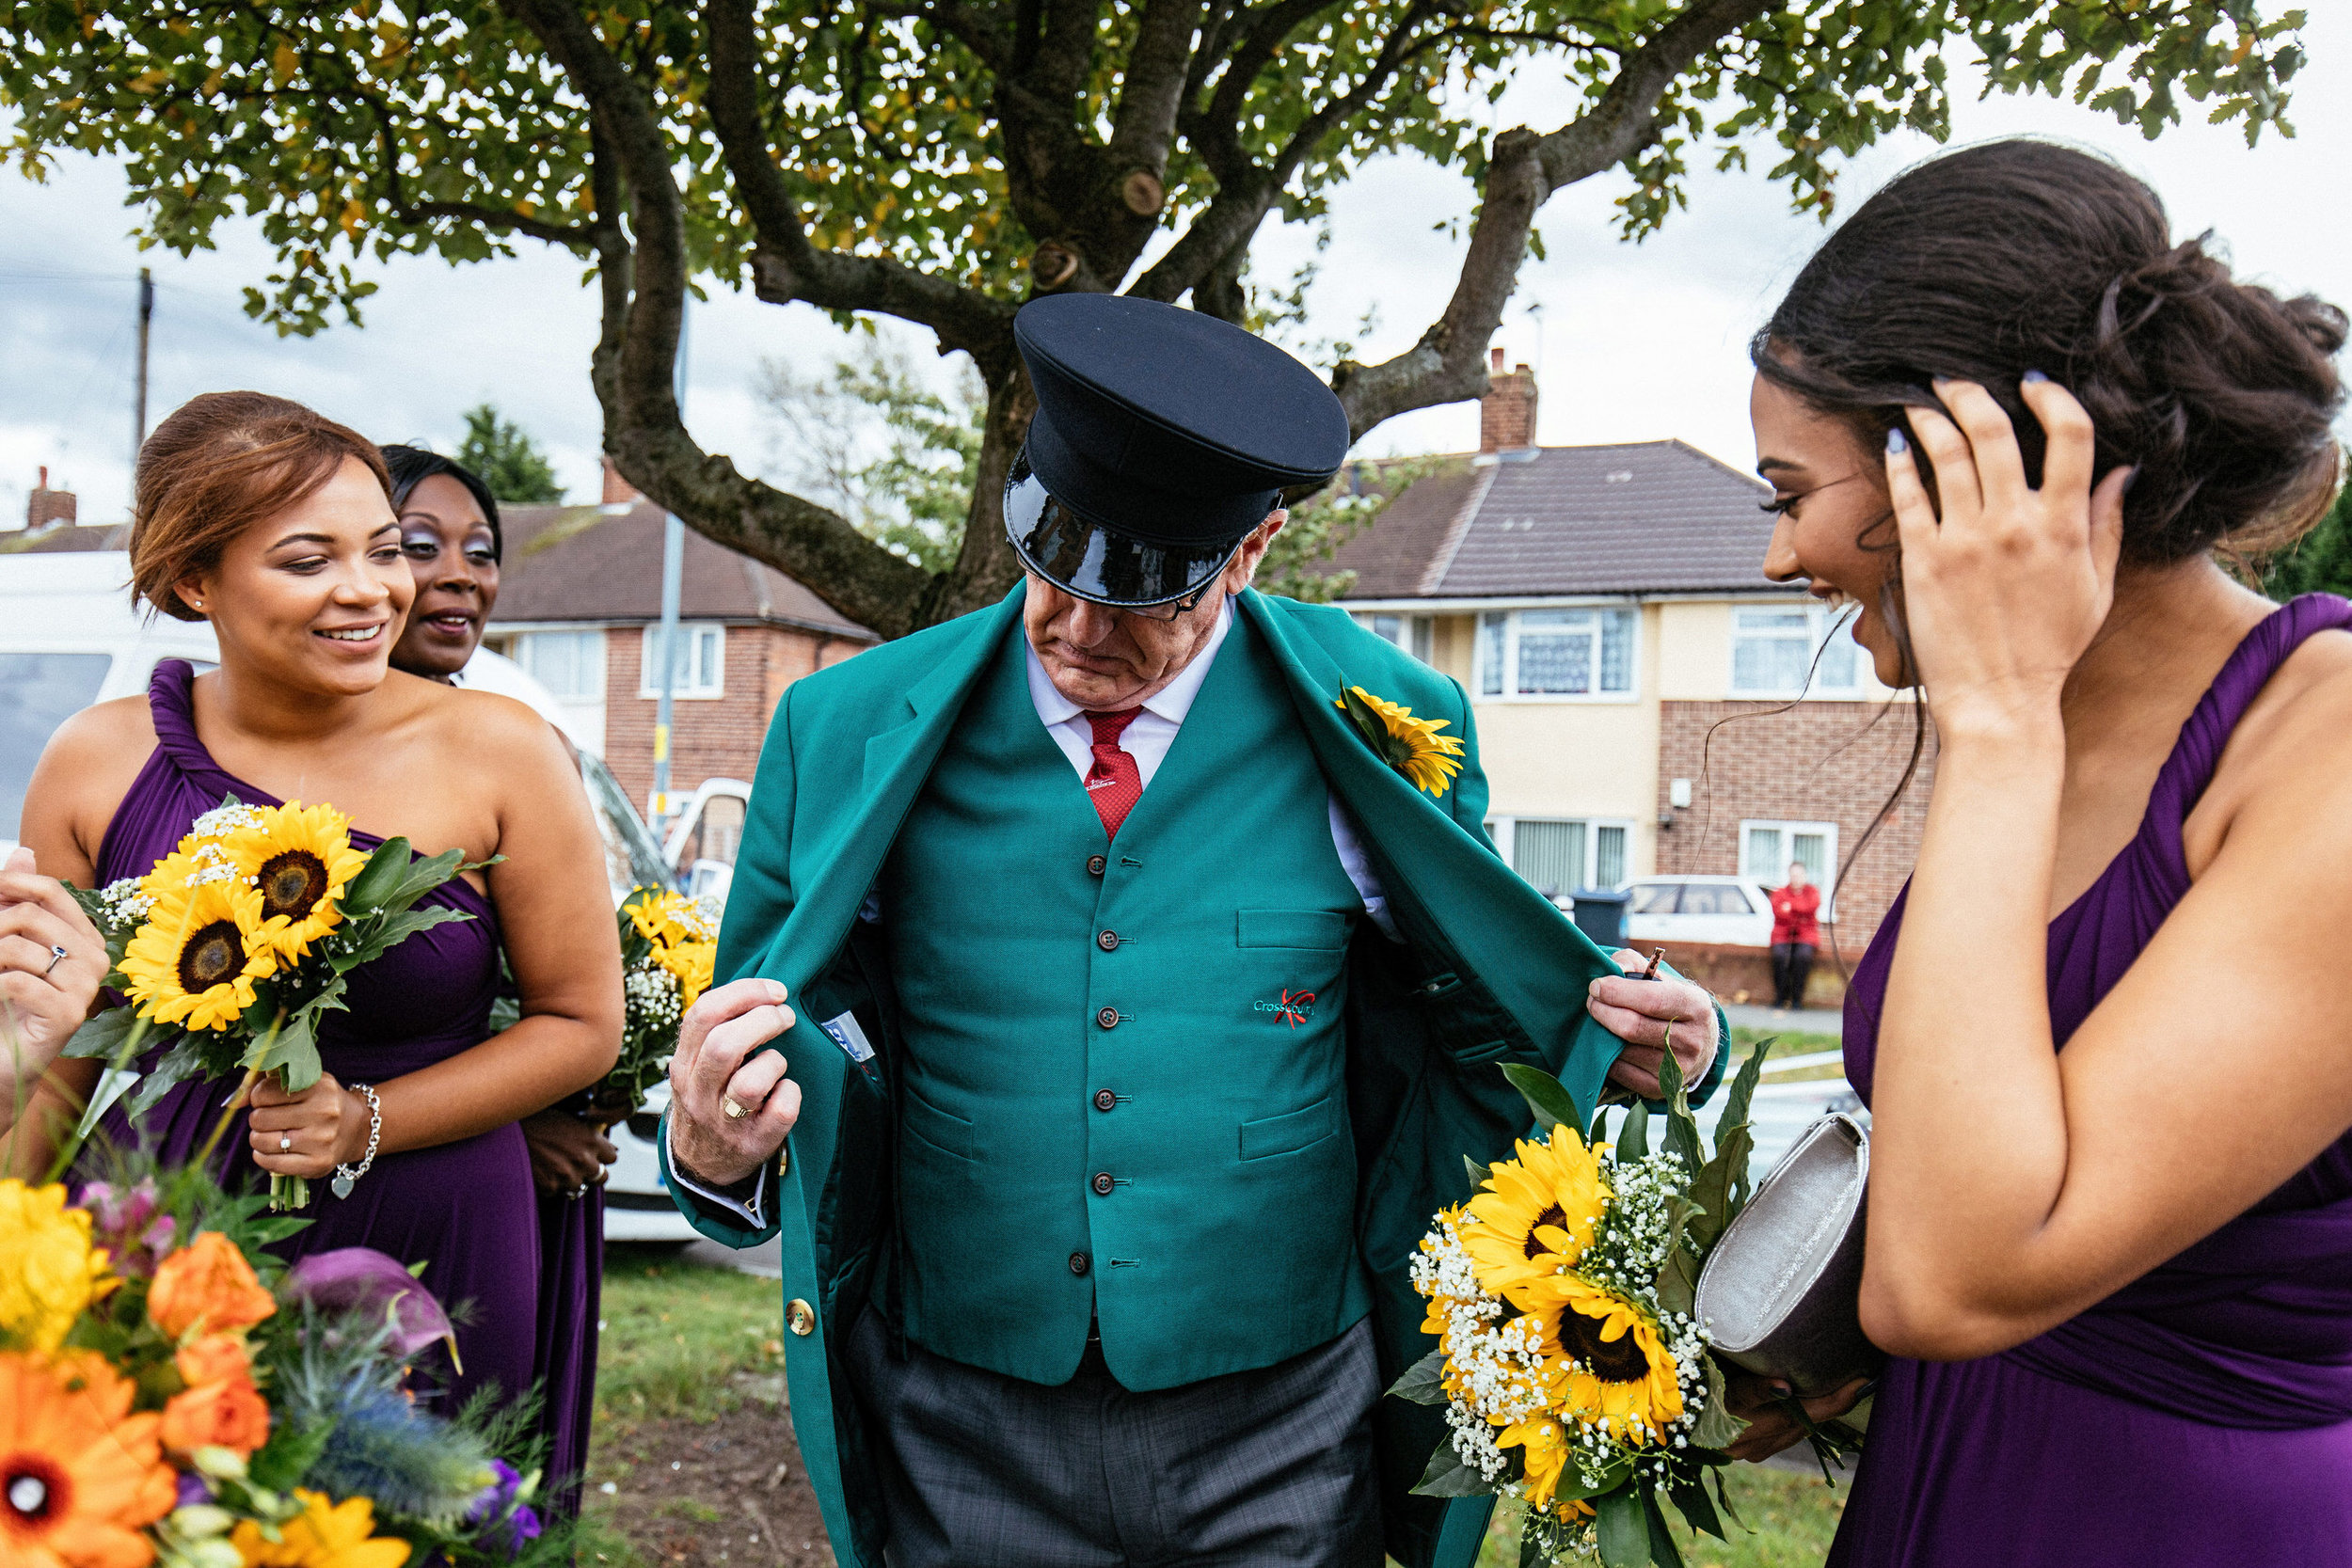 The-Bond-Company-Wedding-Photography-22-1.jpg